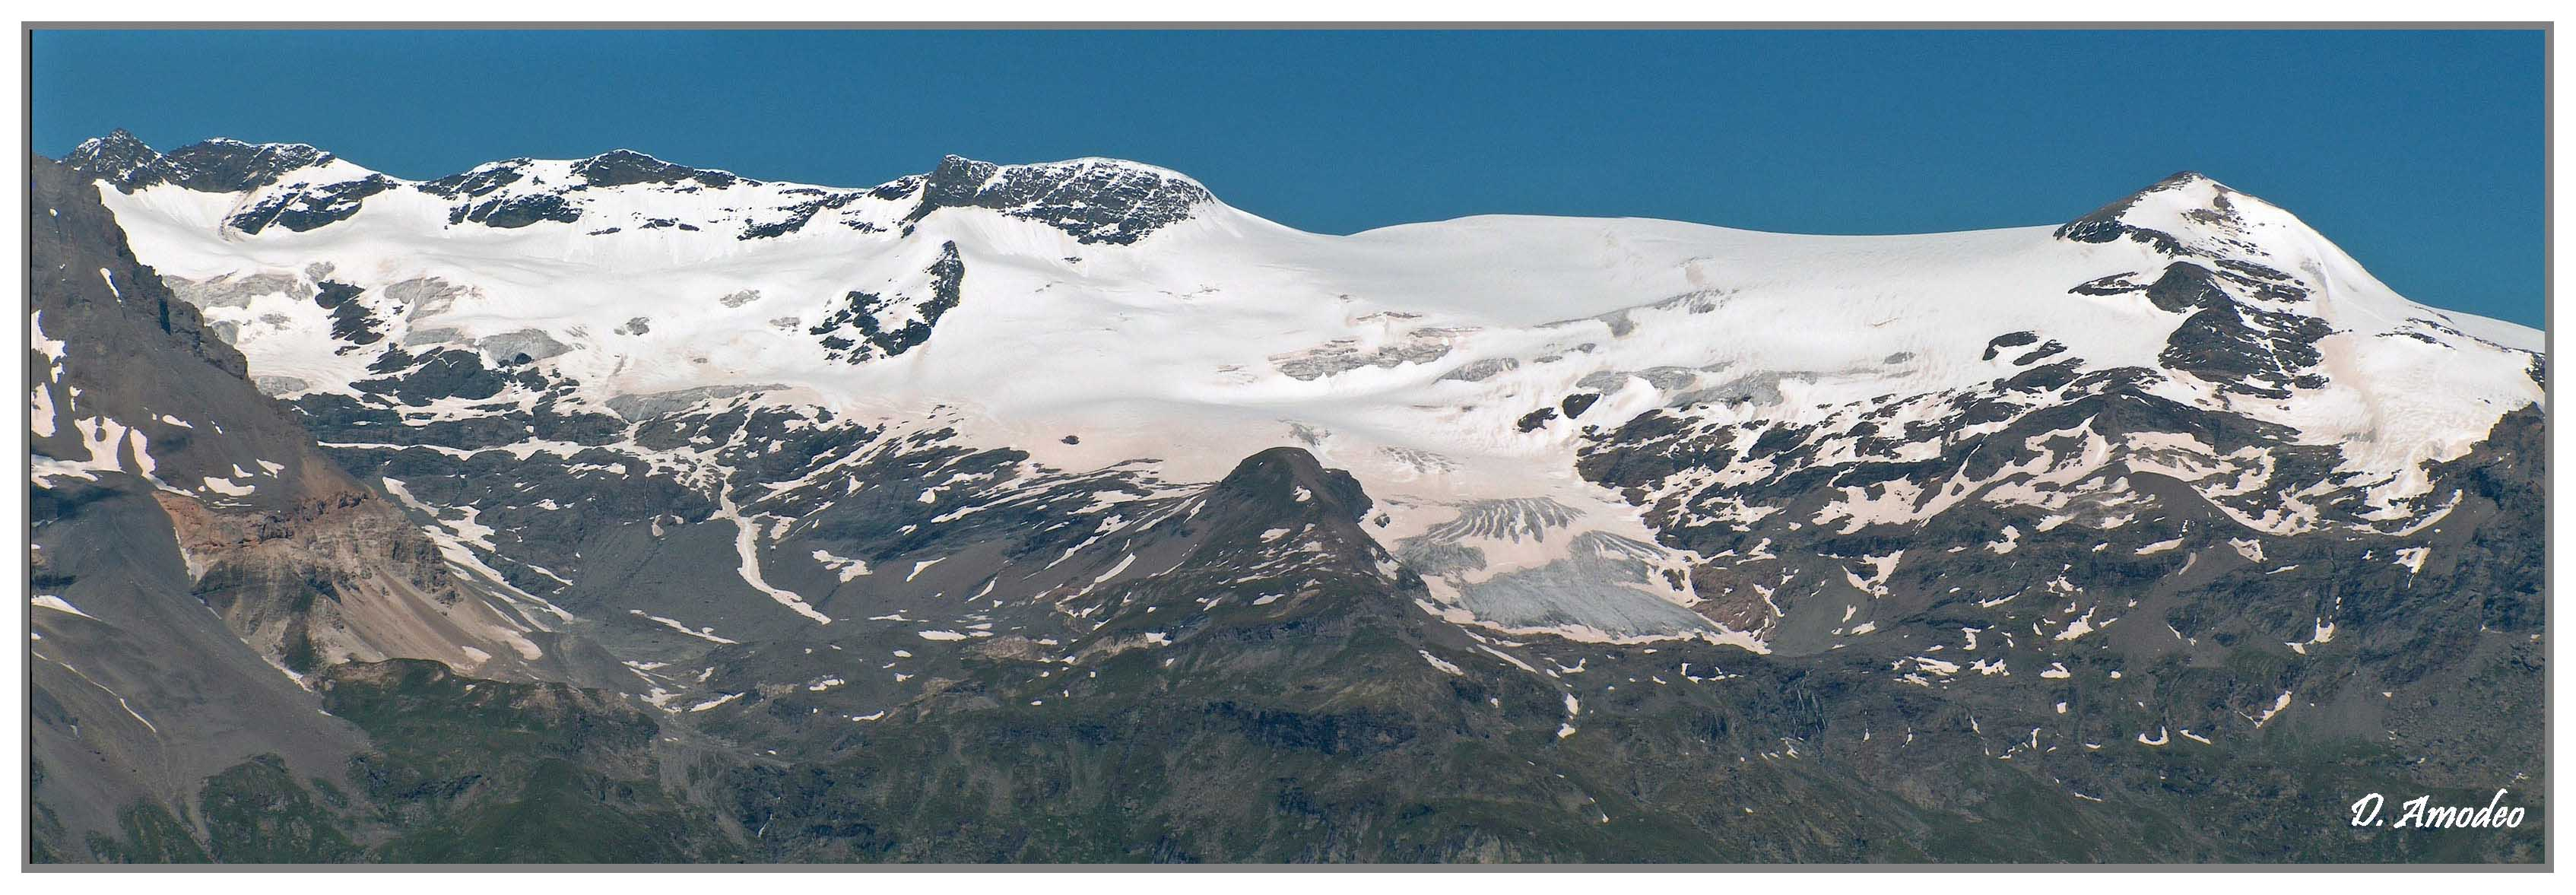 Ghiacciaio Vanoise-panorama.jpg